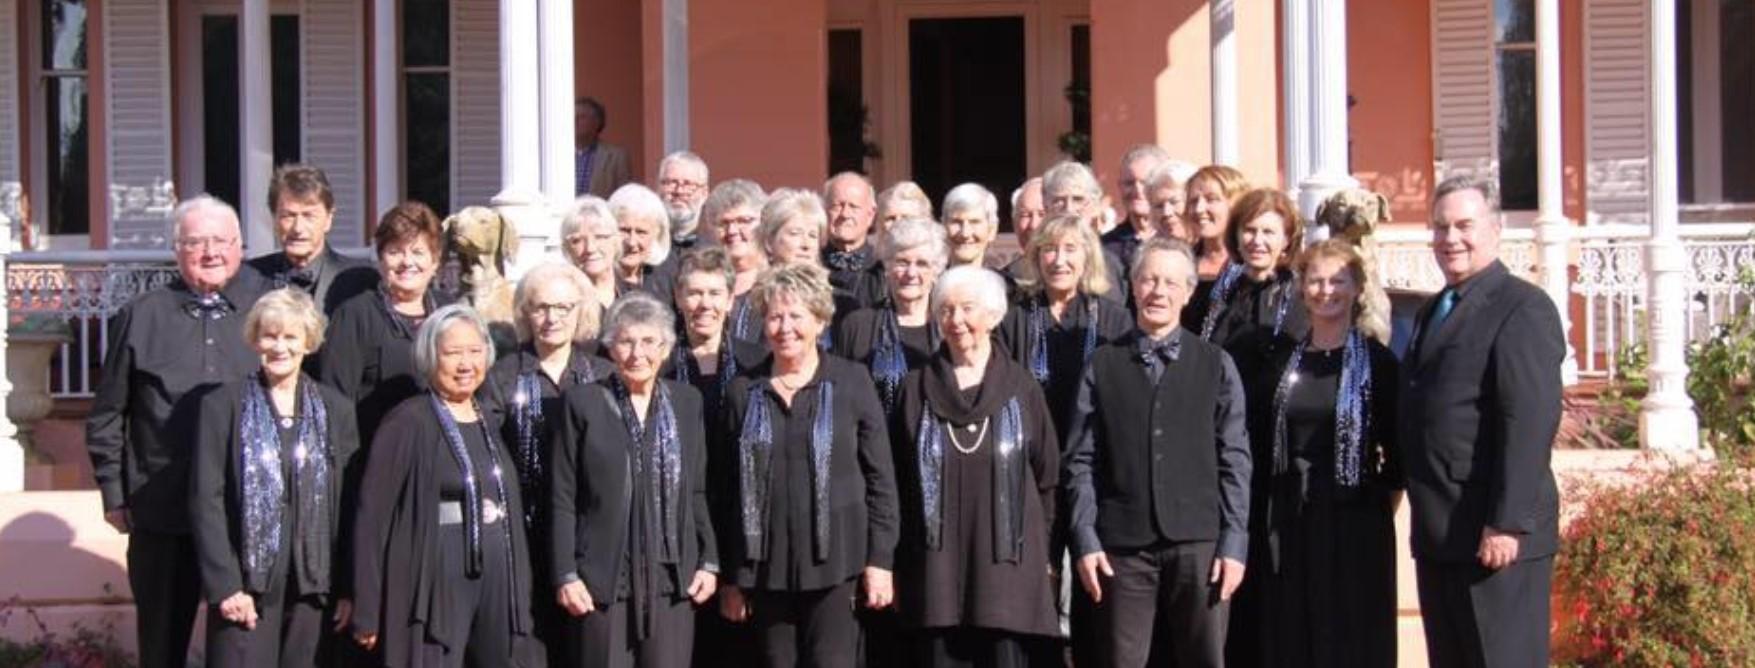 The Allegri Singers